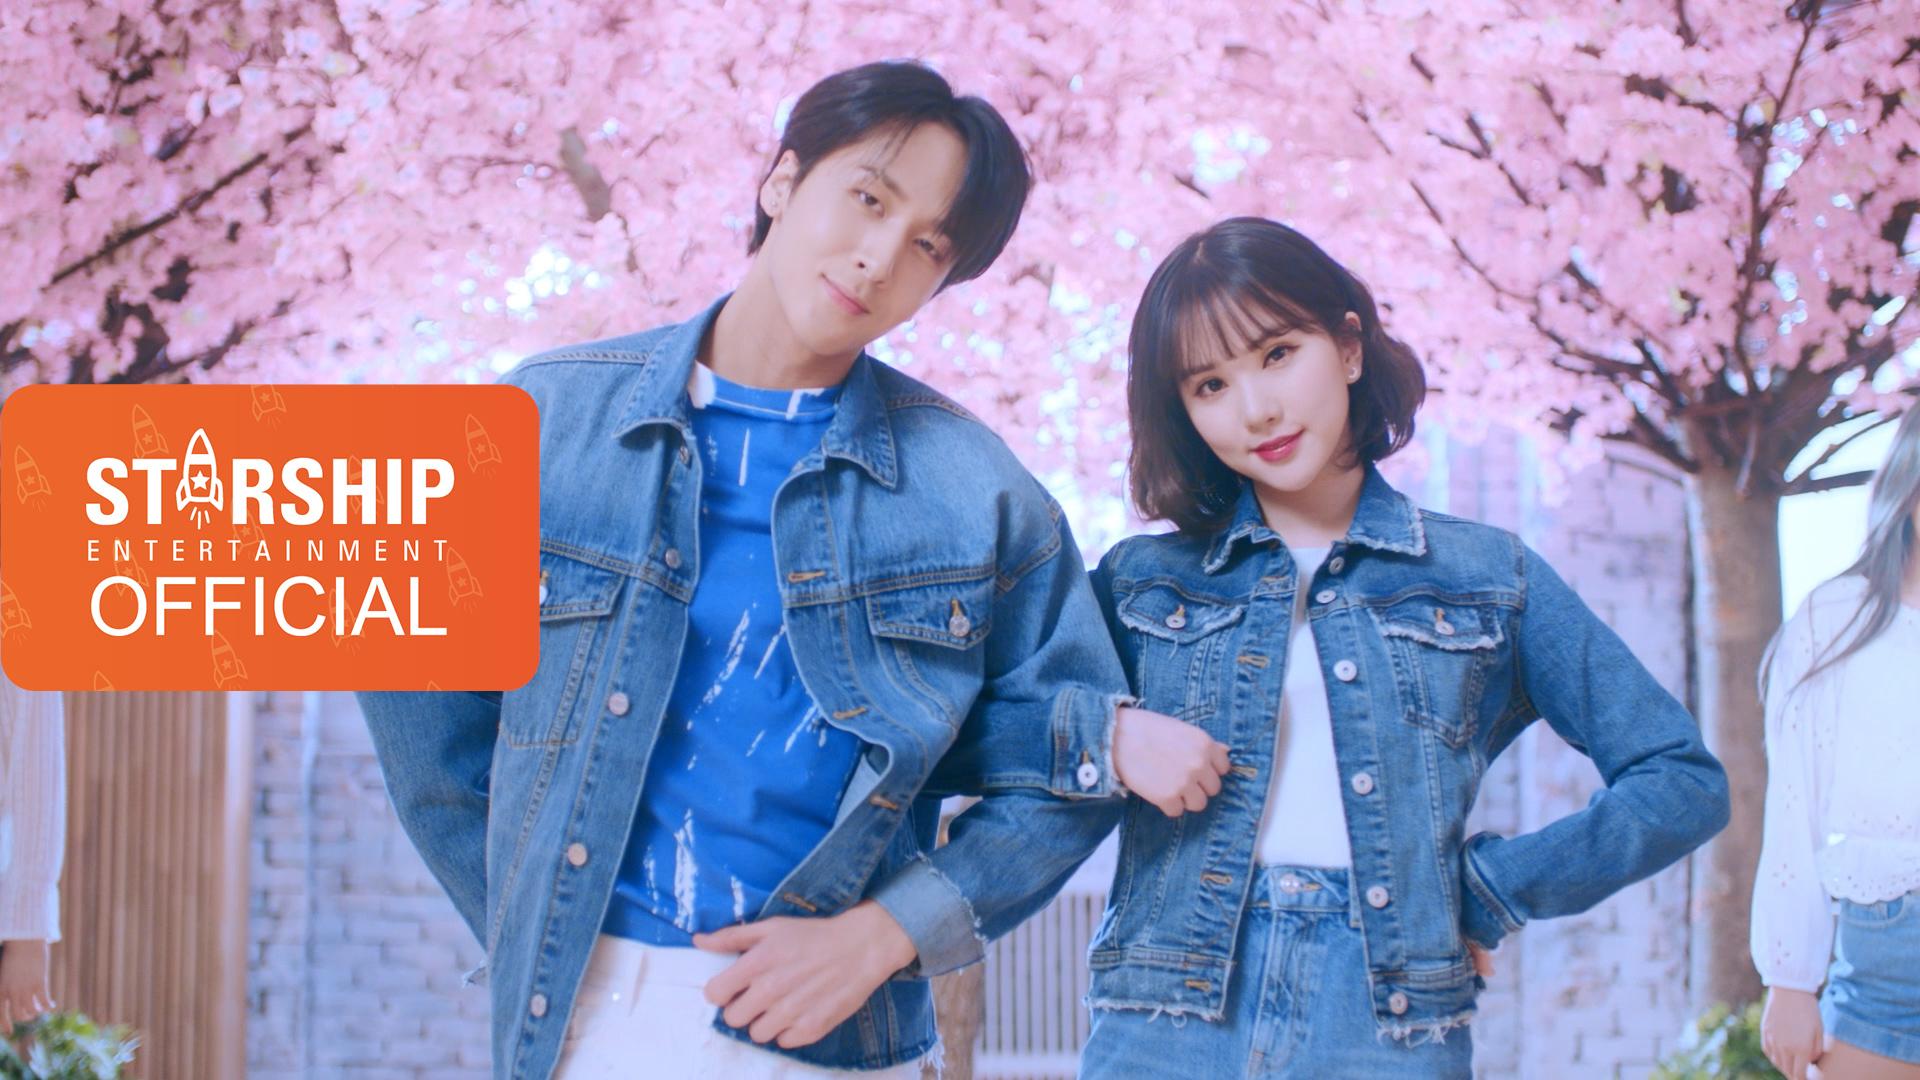 [MV] 은하 (Eunha) X 라비 (Ravi) - BLOSSOM (Prod. Groovyroom)